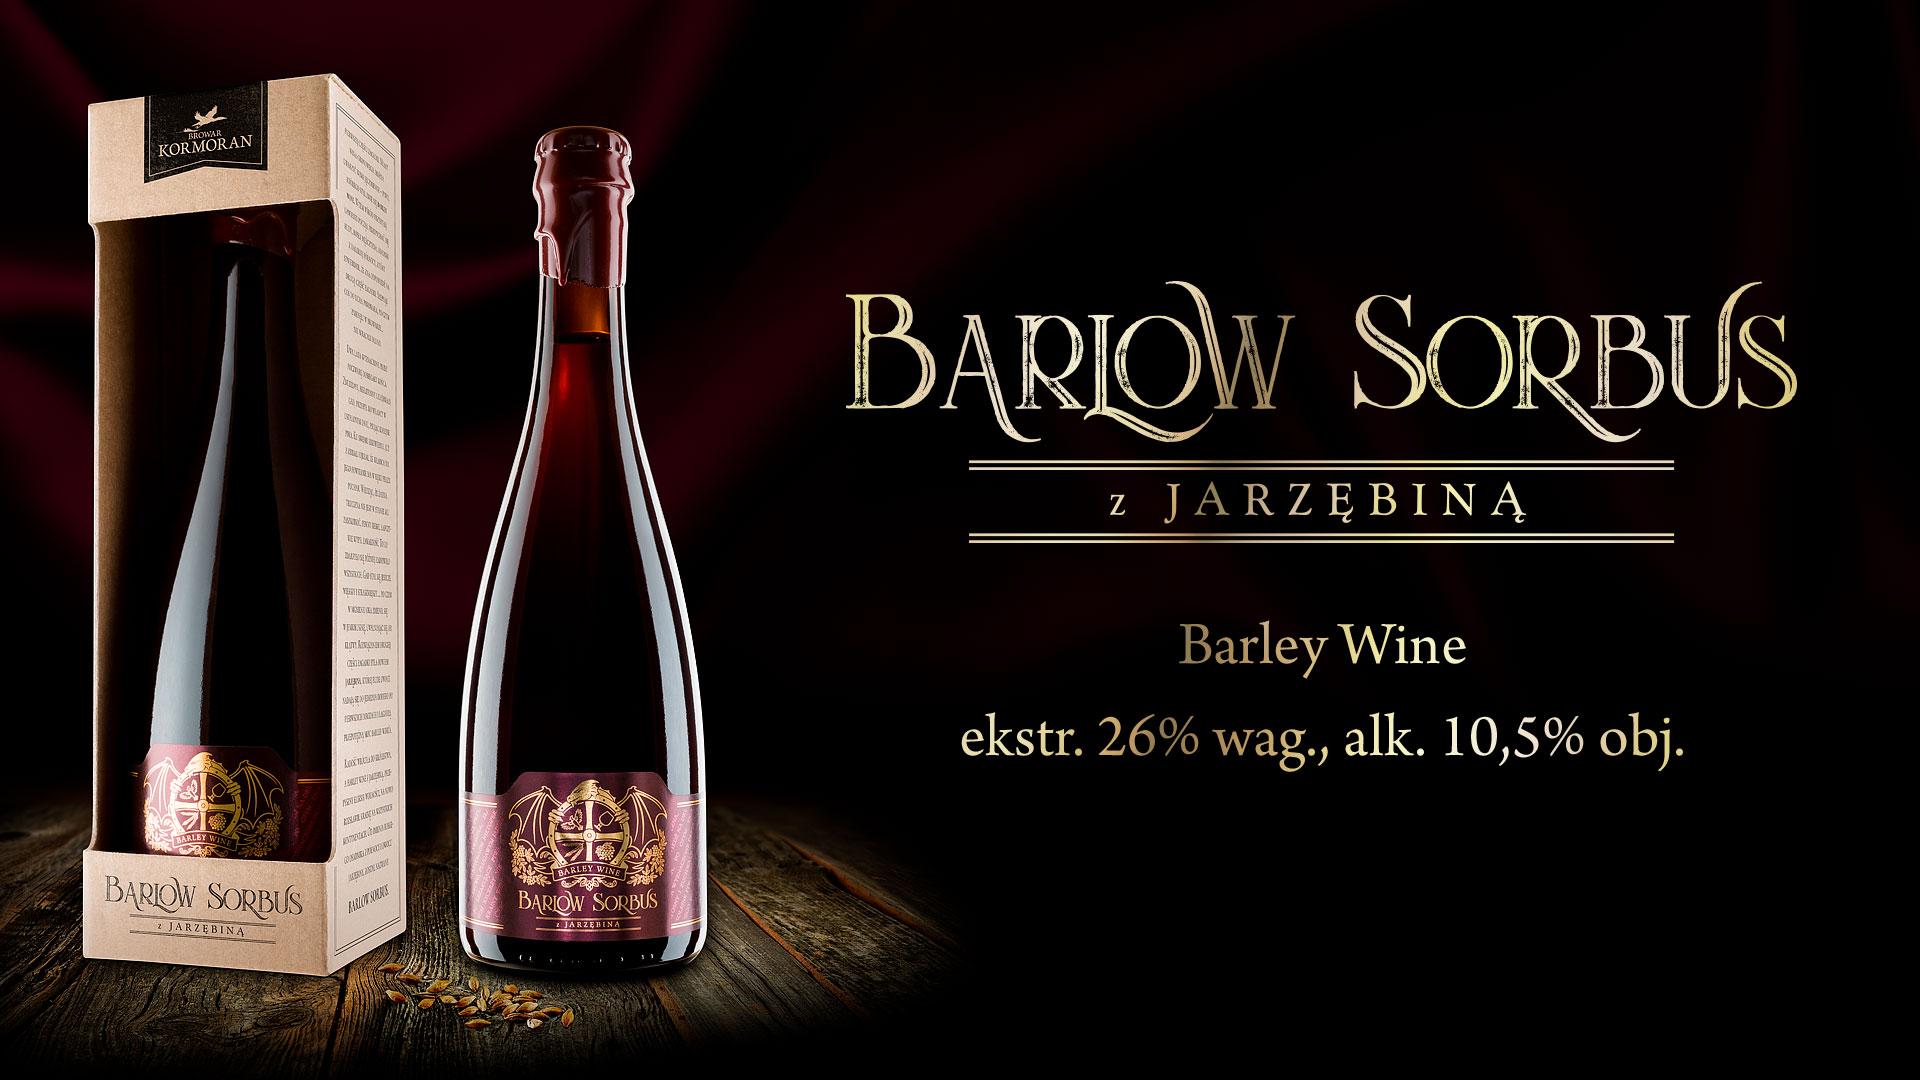 https://browarkormoran.pl/wp-content/uploads/piwo-barlow-sorbus-browar-kormoran-2018.jpg